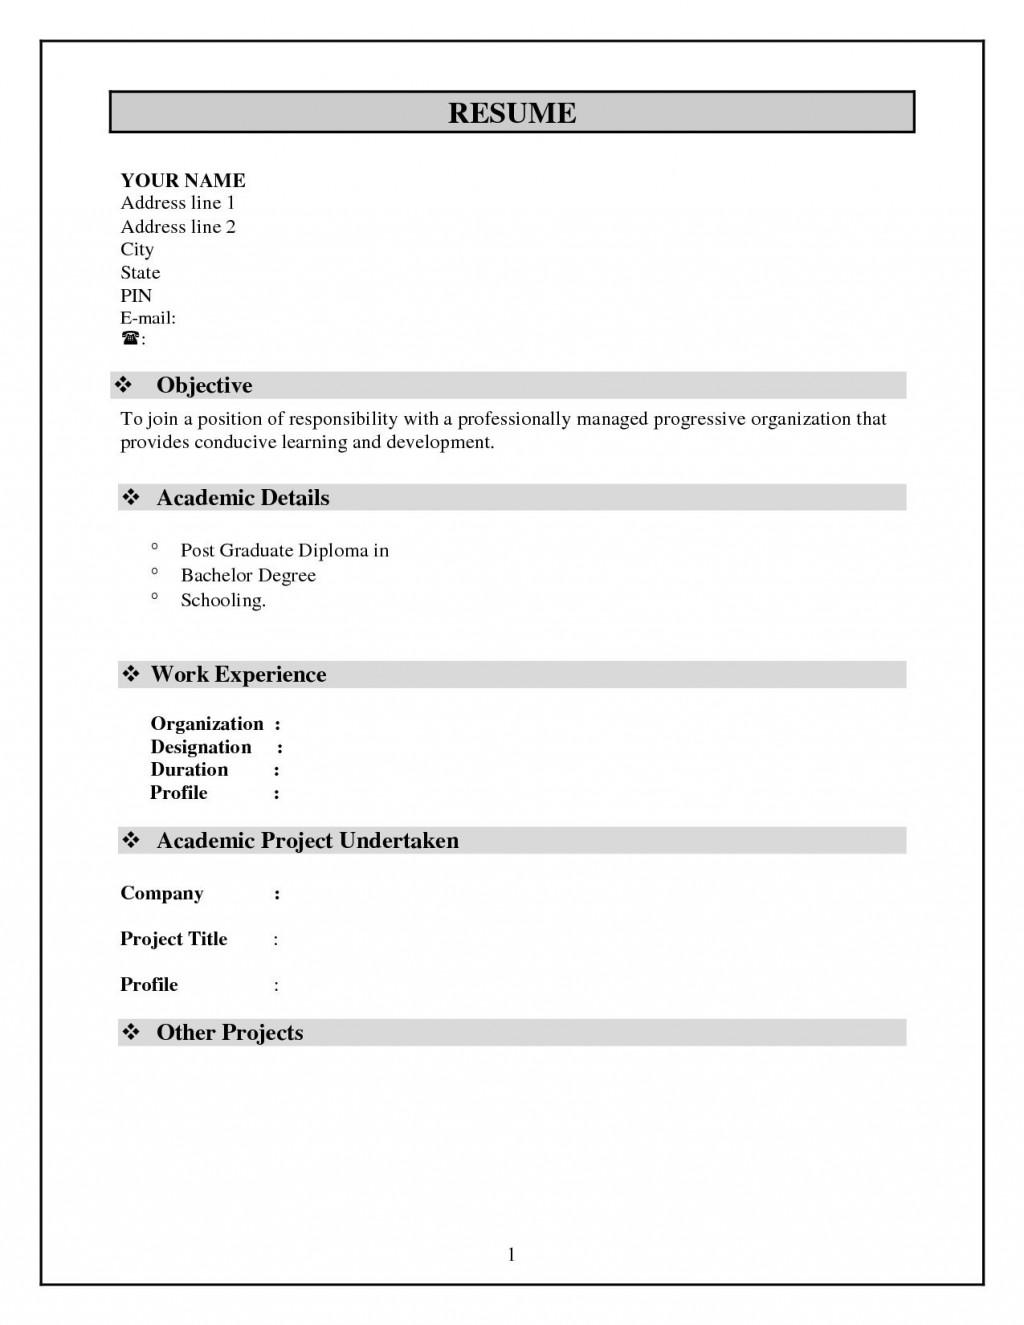 000 Surprising Basic Resume Template Word Idea  Free Download 2020Large